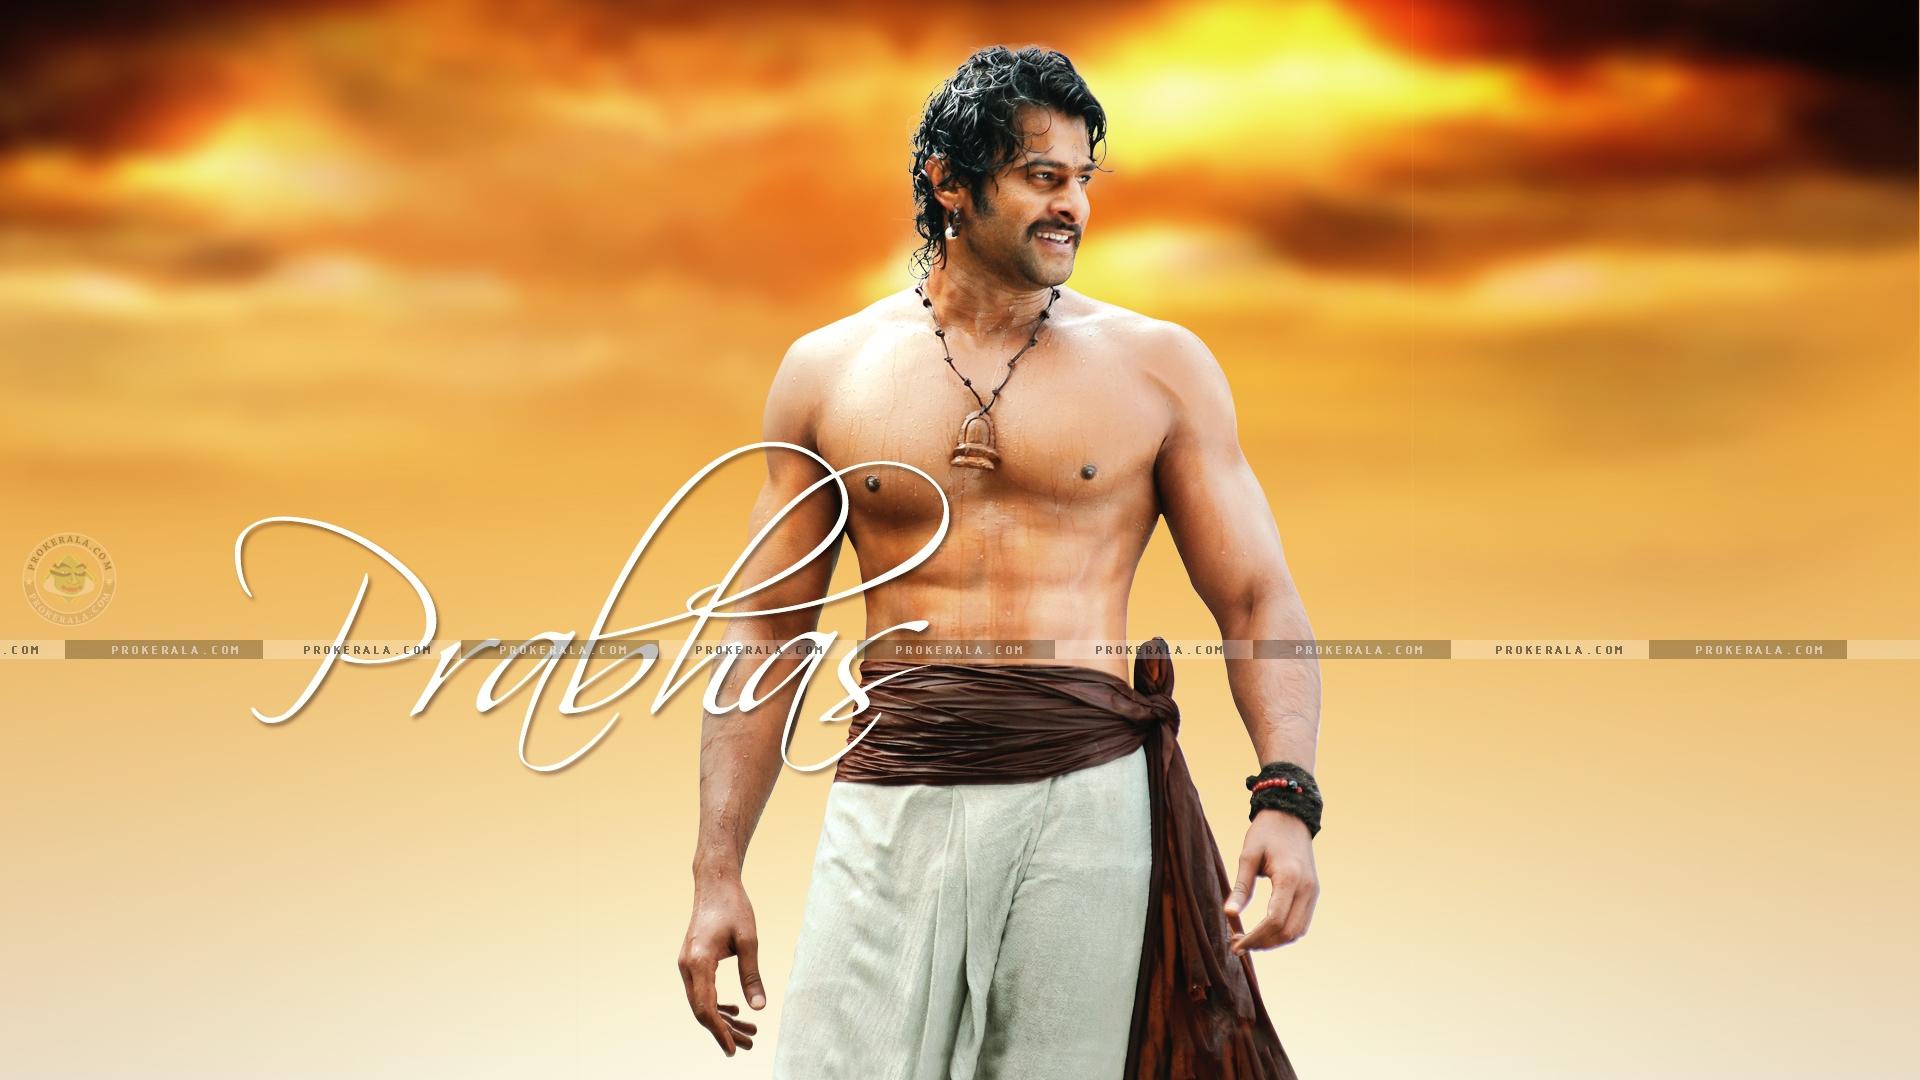 Prabhas Hd Images New